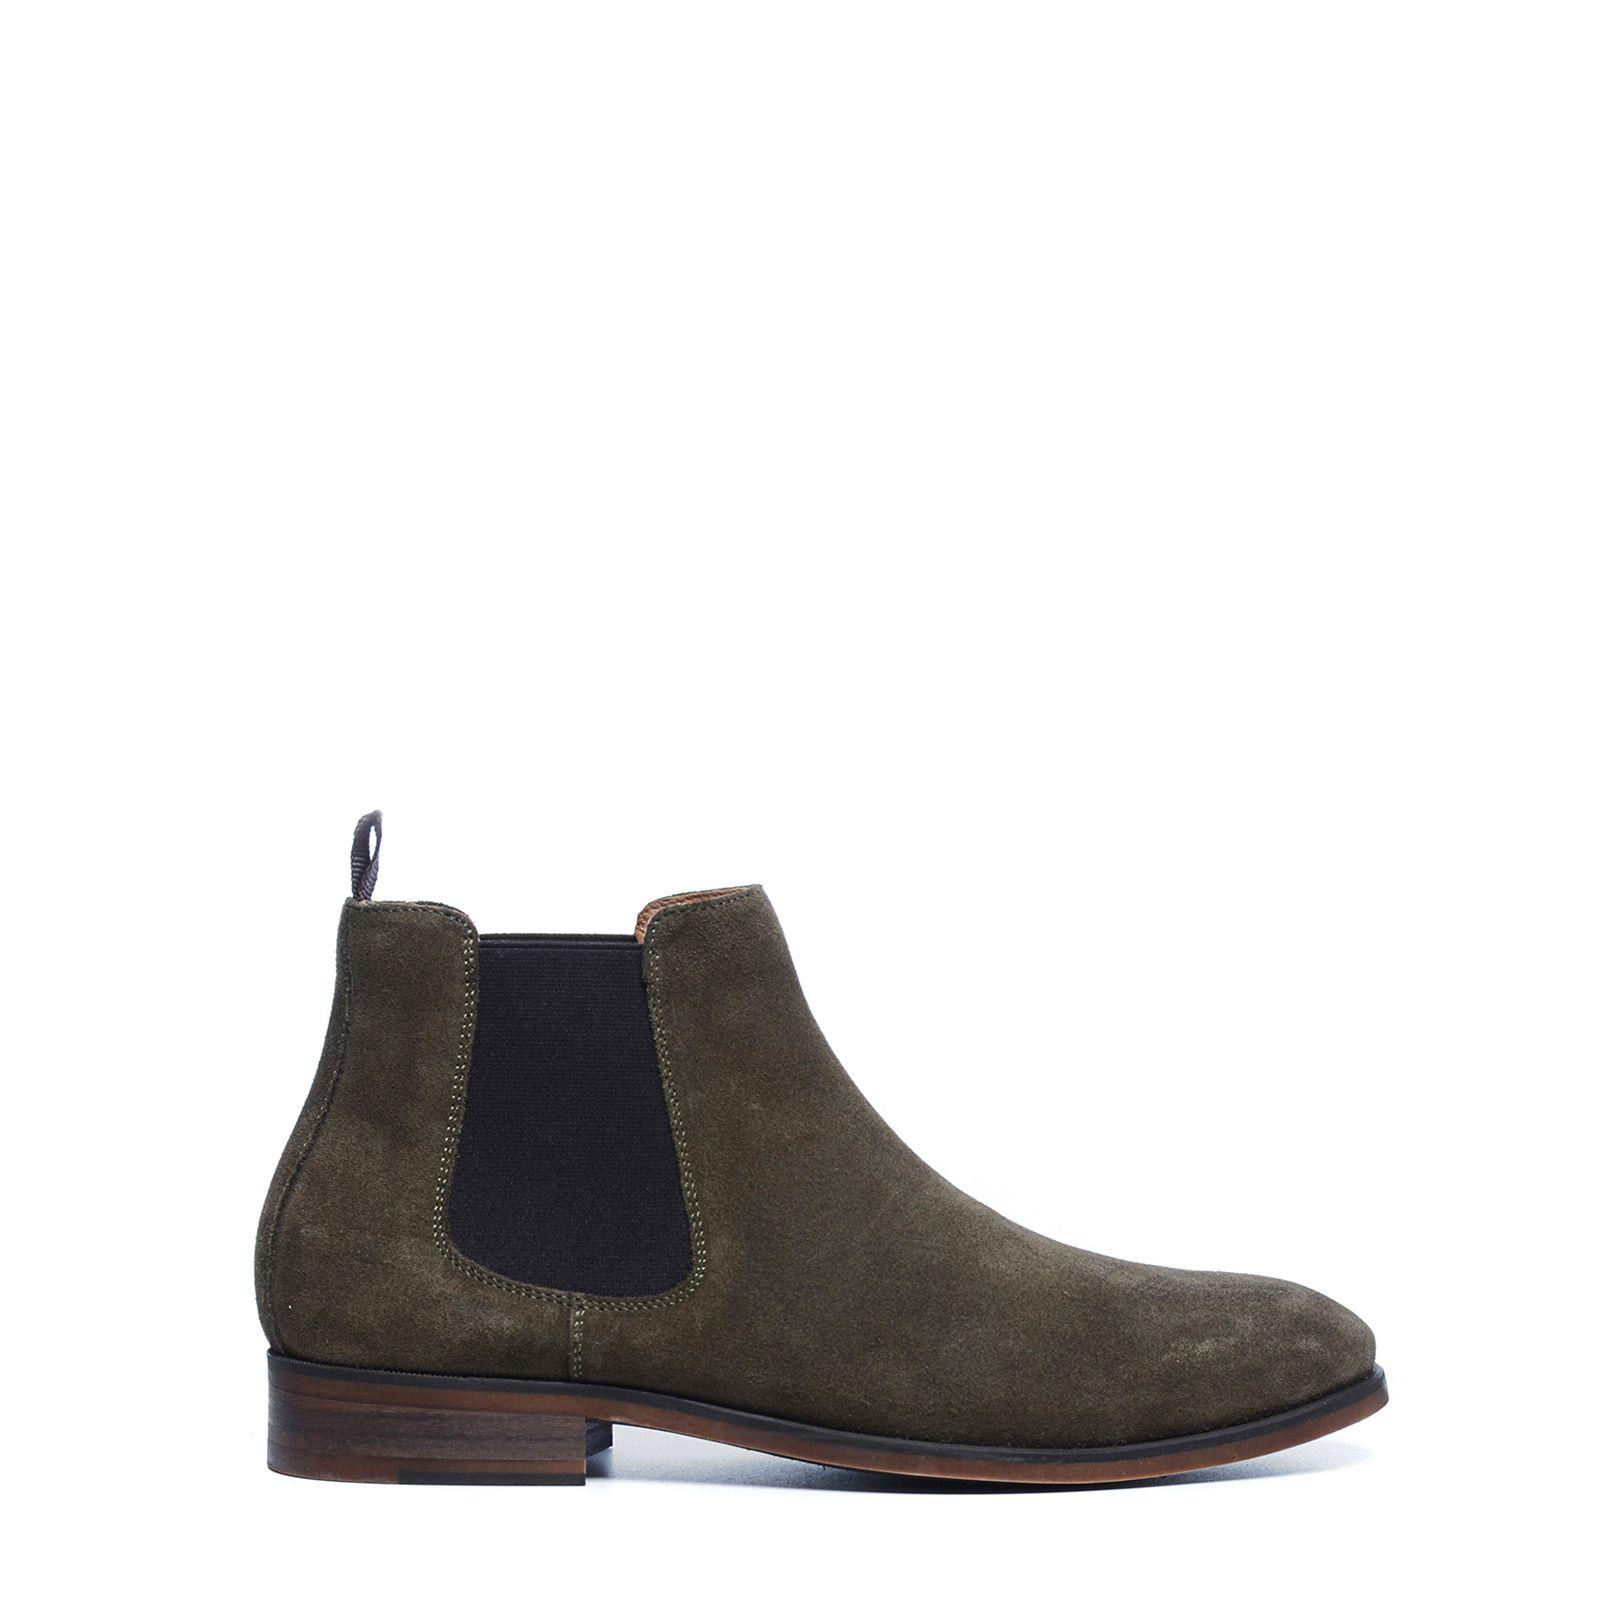 Cognacfarbene Chelsea Boots mit Schlangenmuster